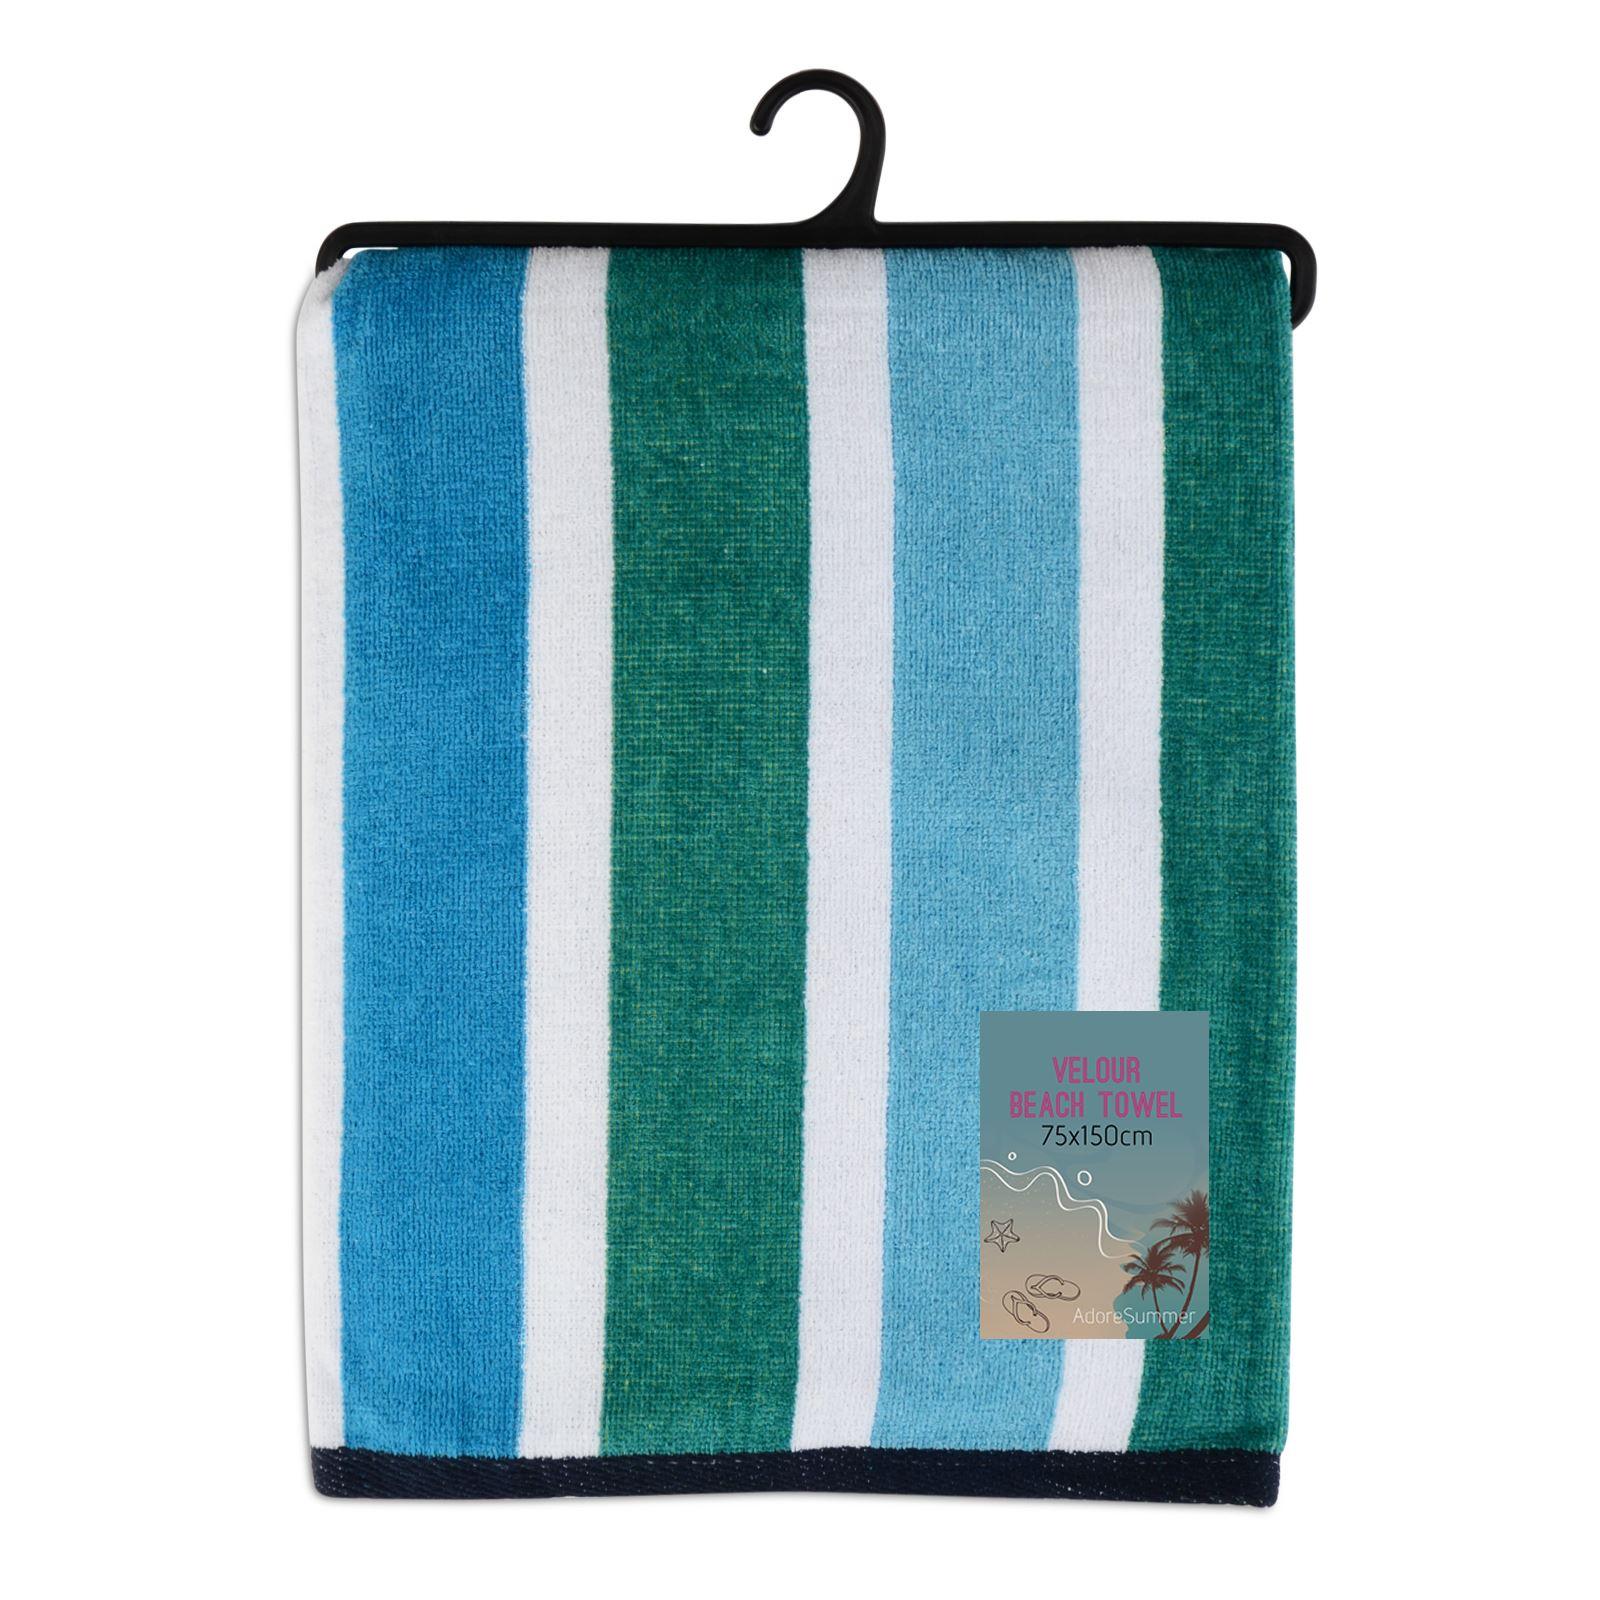 Bathroom Towels Striped: Large Velour Beach Bath Towels Cotton Striped Towels